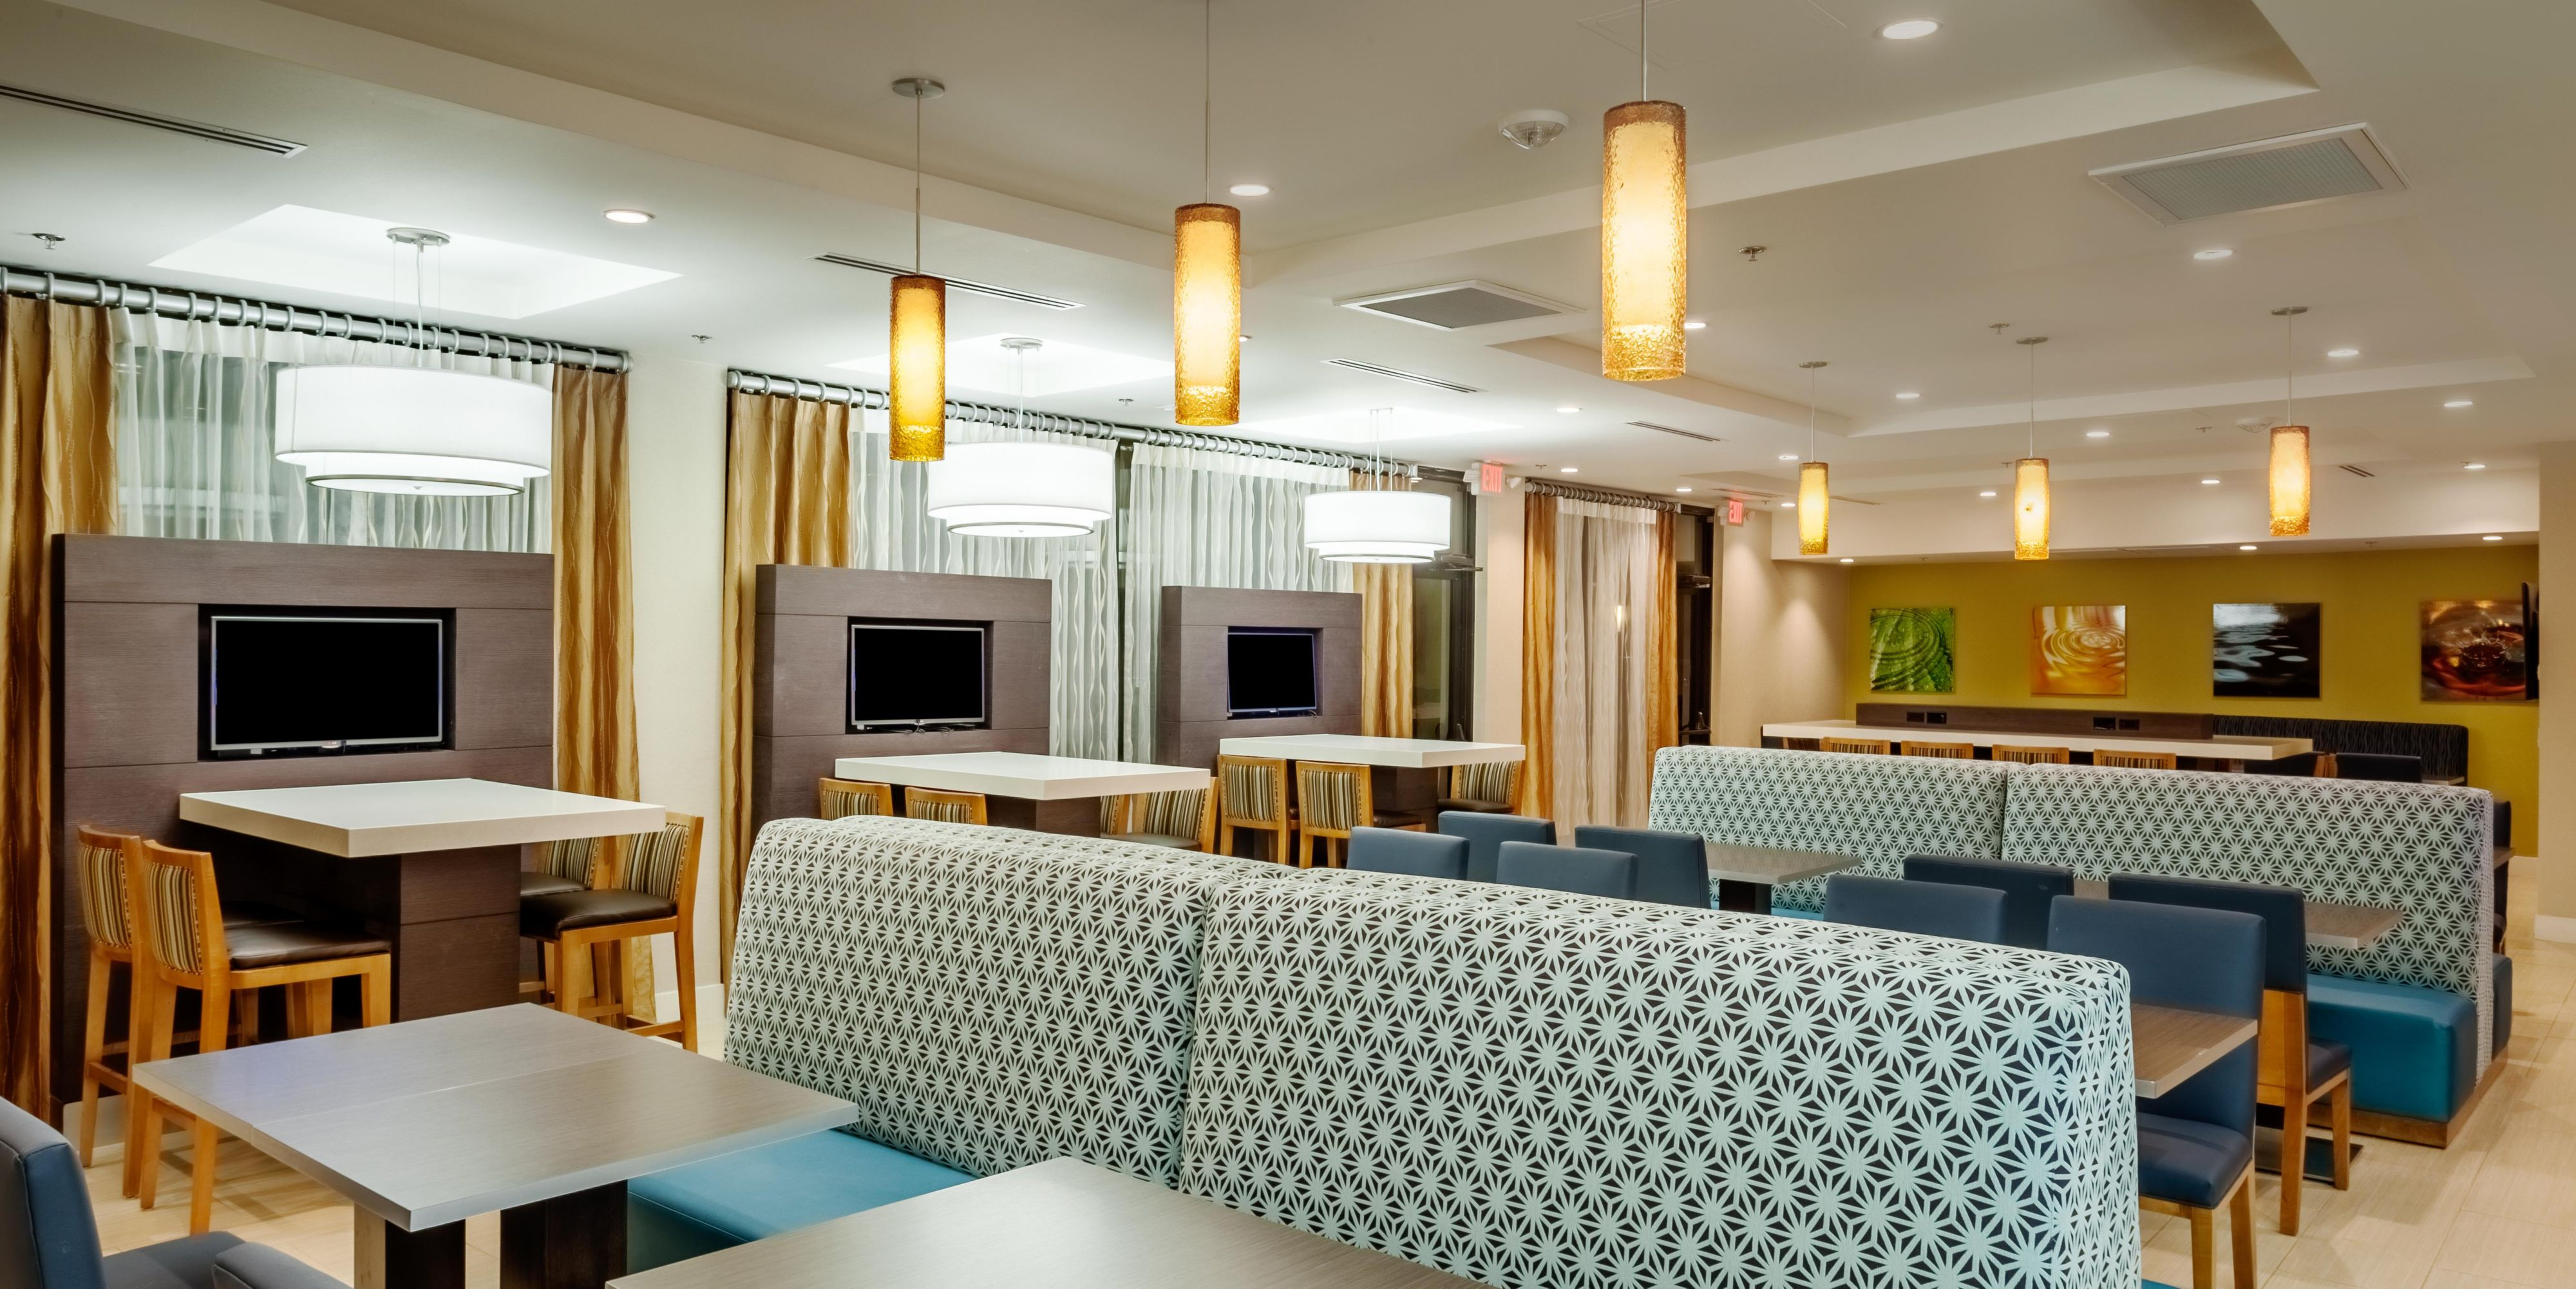 resort surfrider inn comfort scenic accommodations comforter in resorts depoe bay min seaside oregon